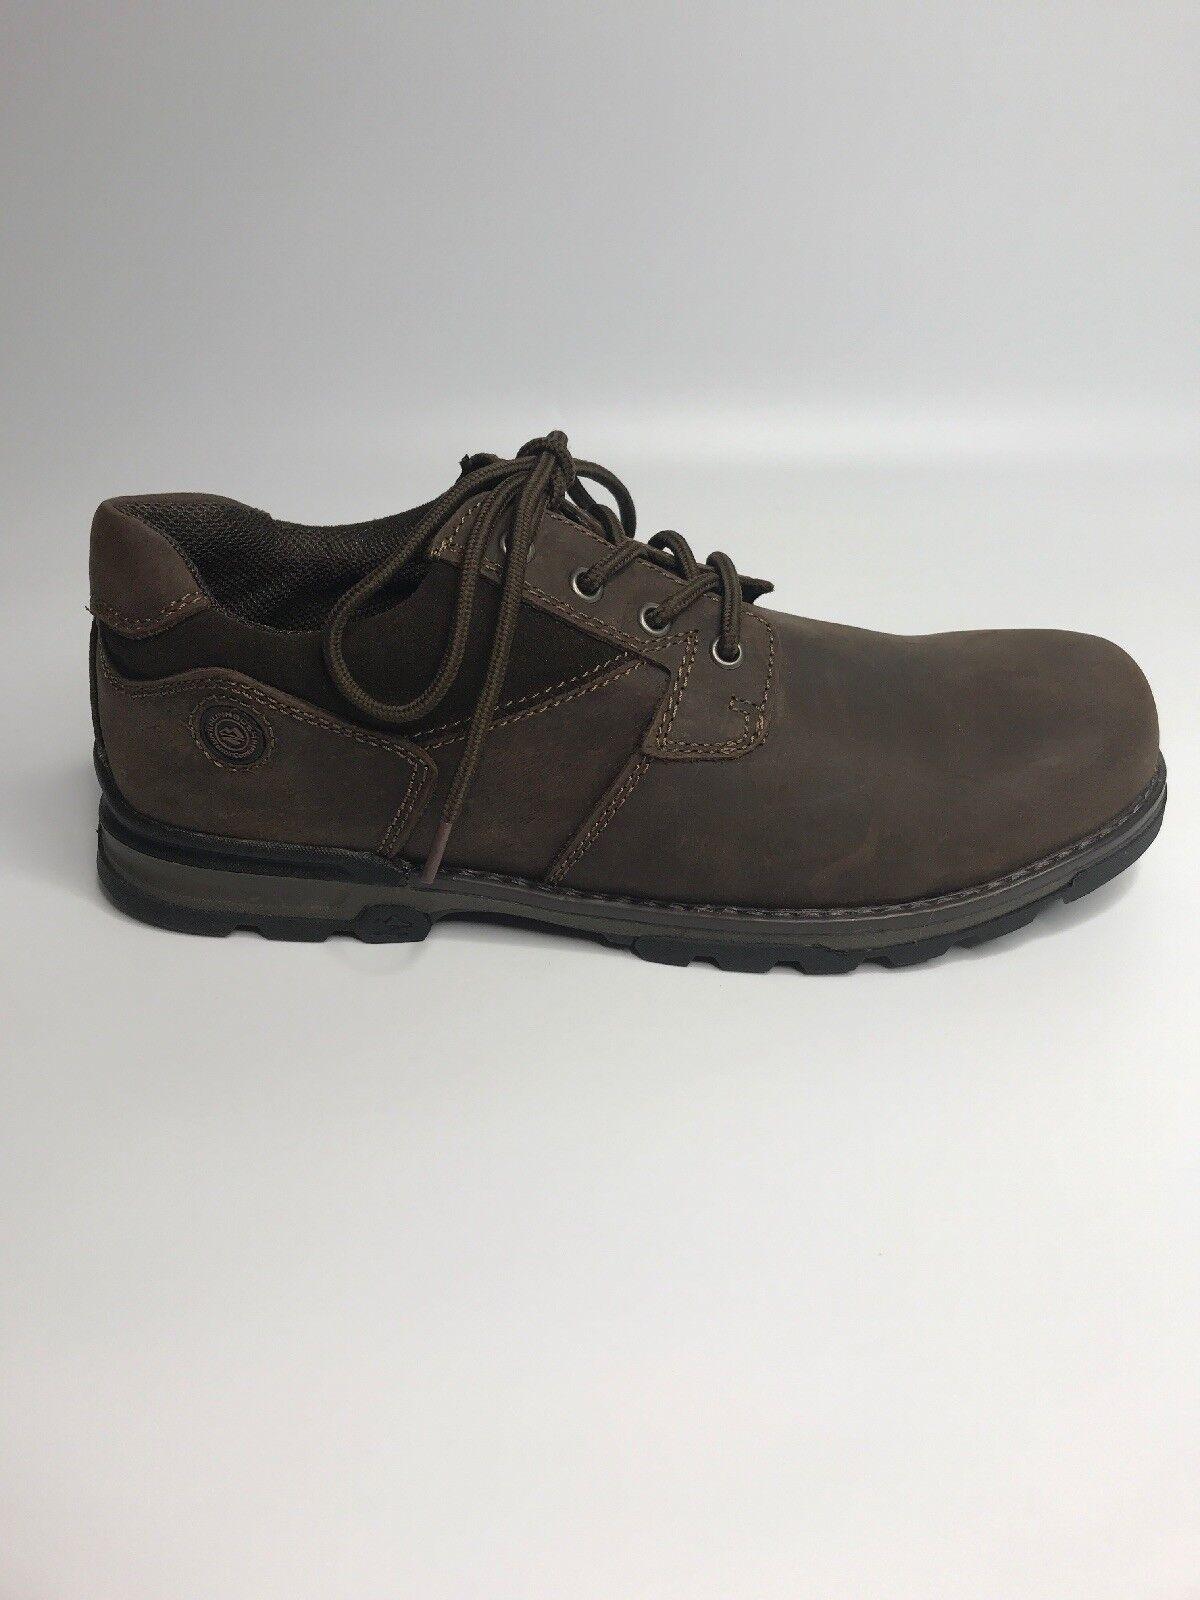 Nunn Bush Para Hombre Zapato Phillip Oxford 84671 Cuero Marrón Talla 7.5 M